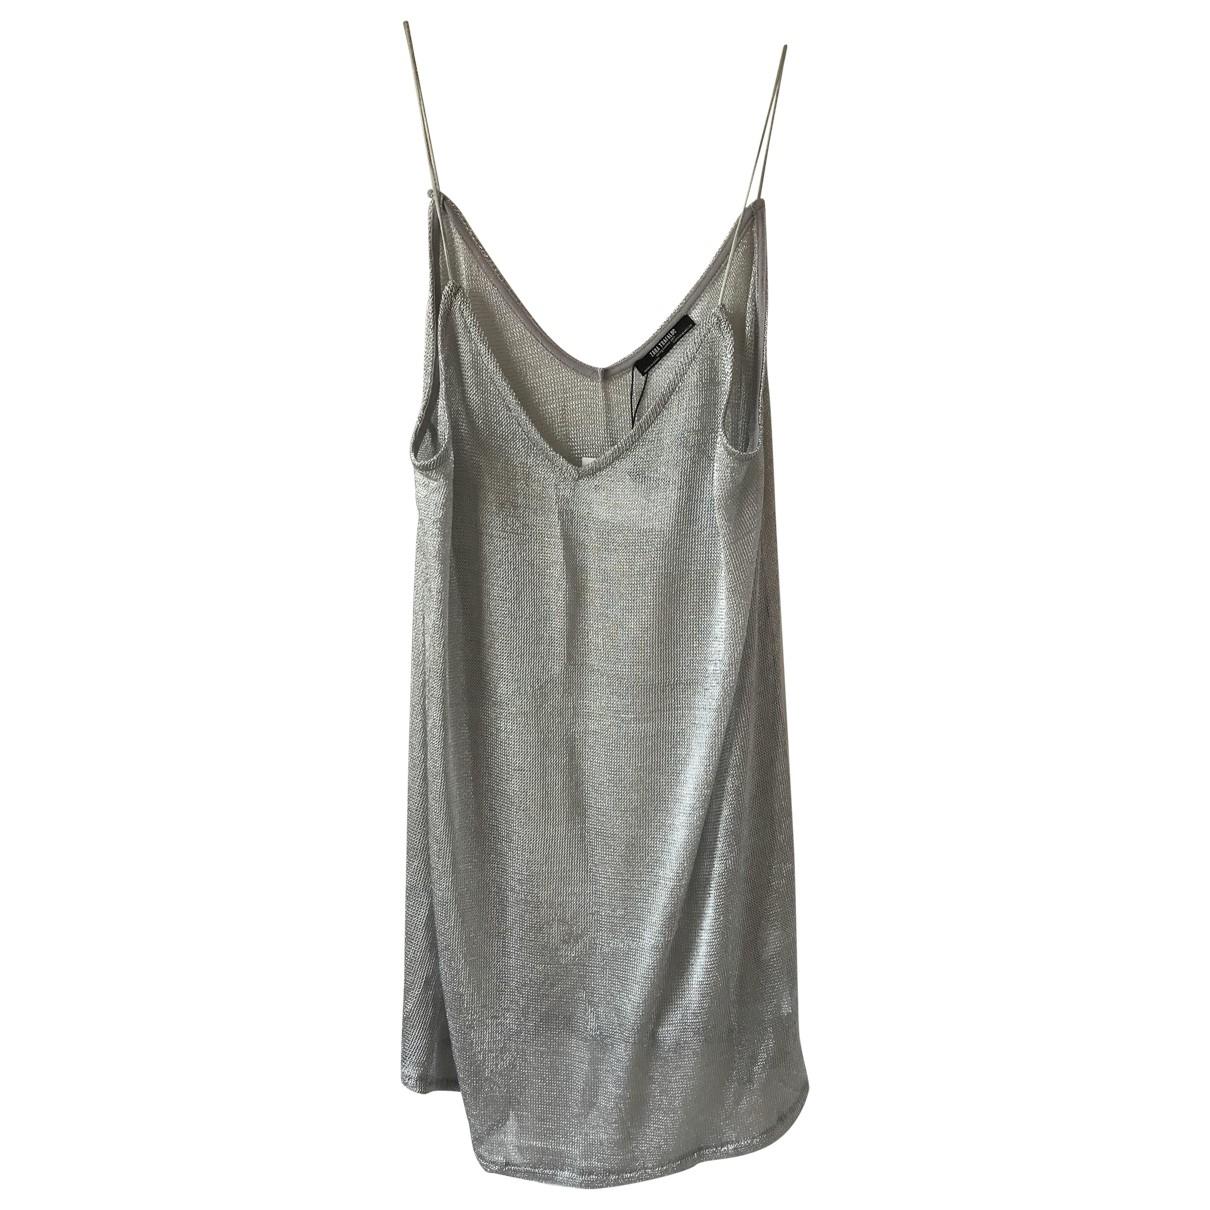 Zara \N Metallic dress for Women M International